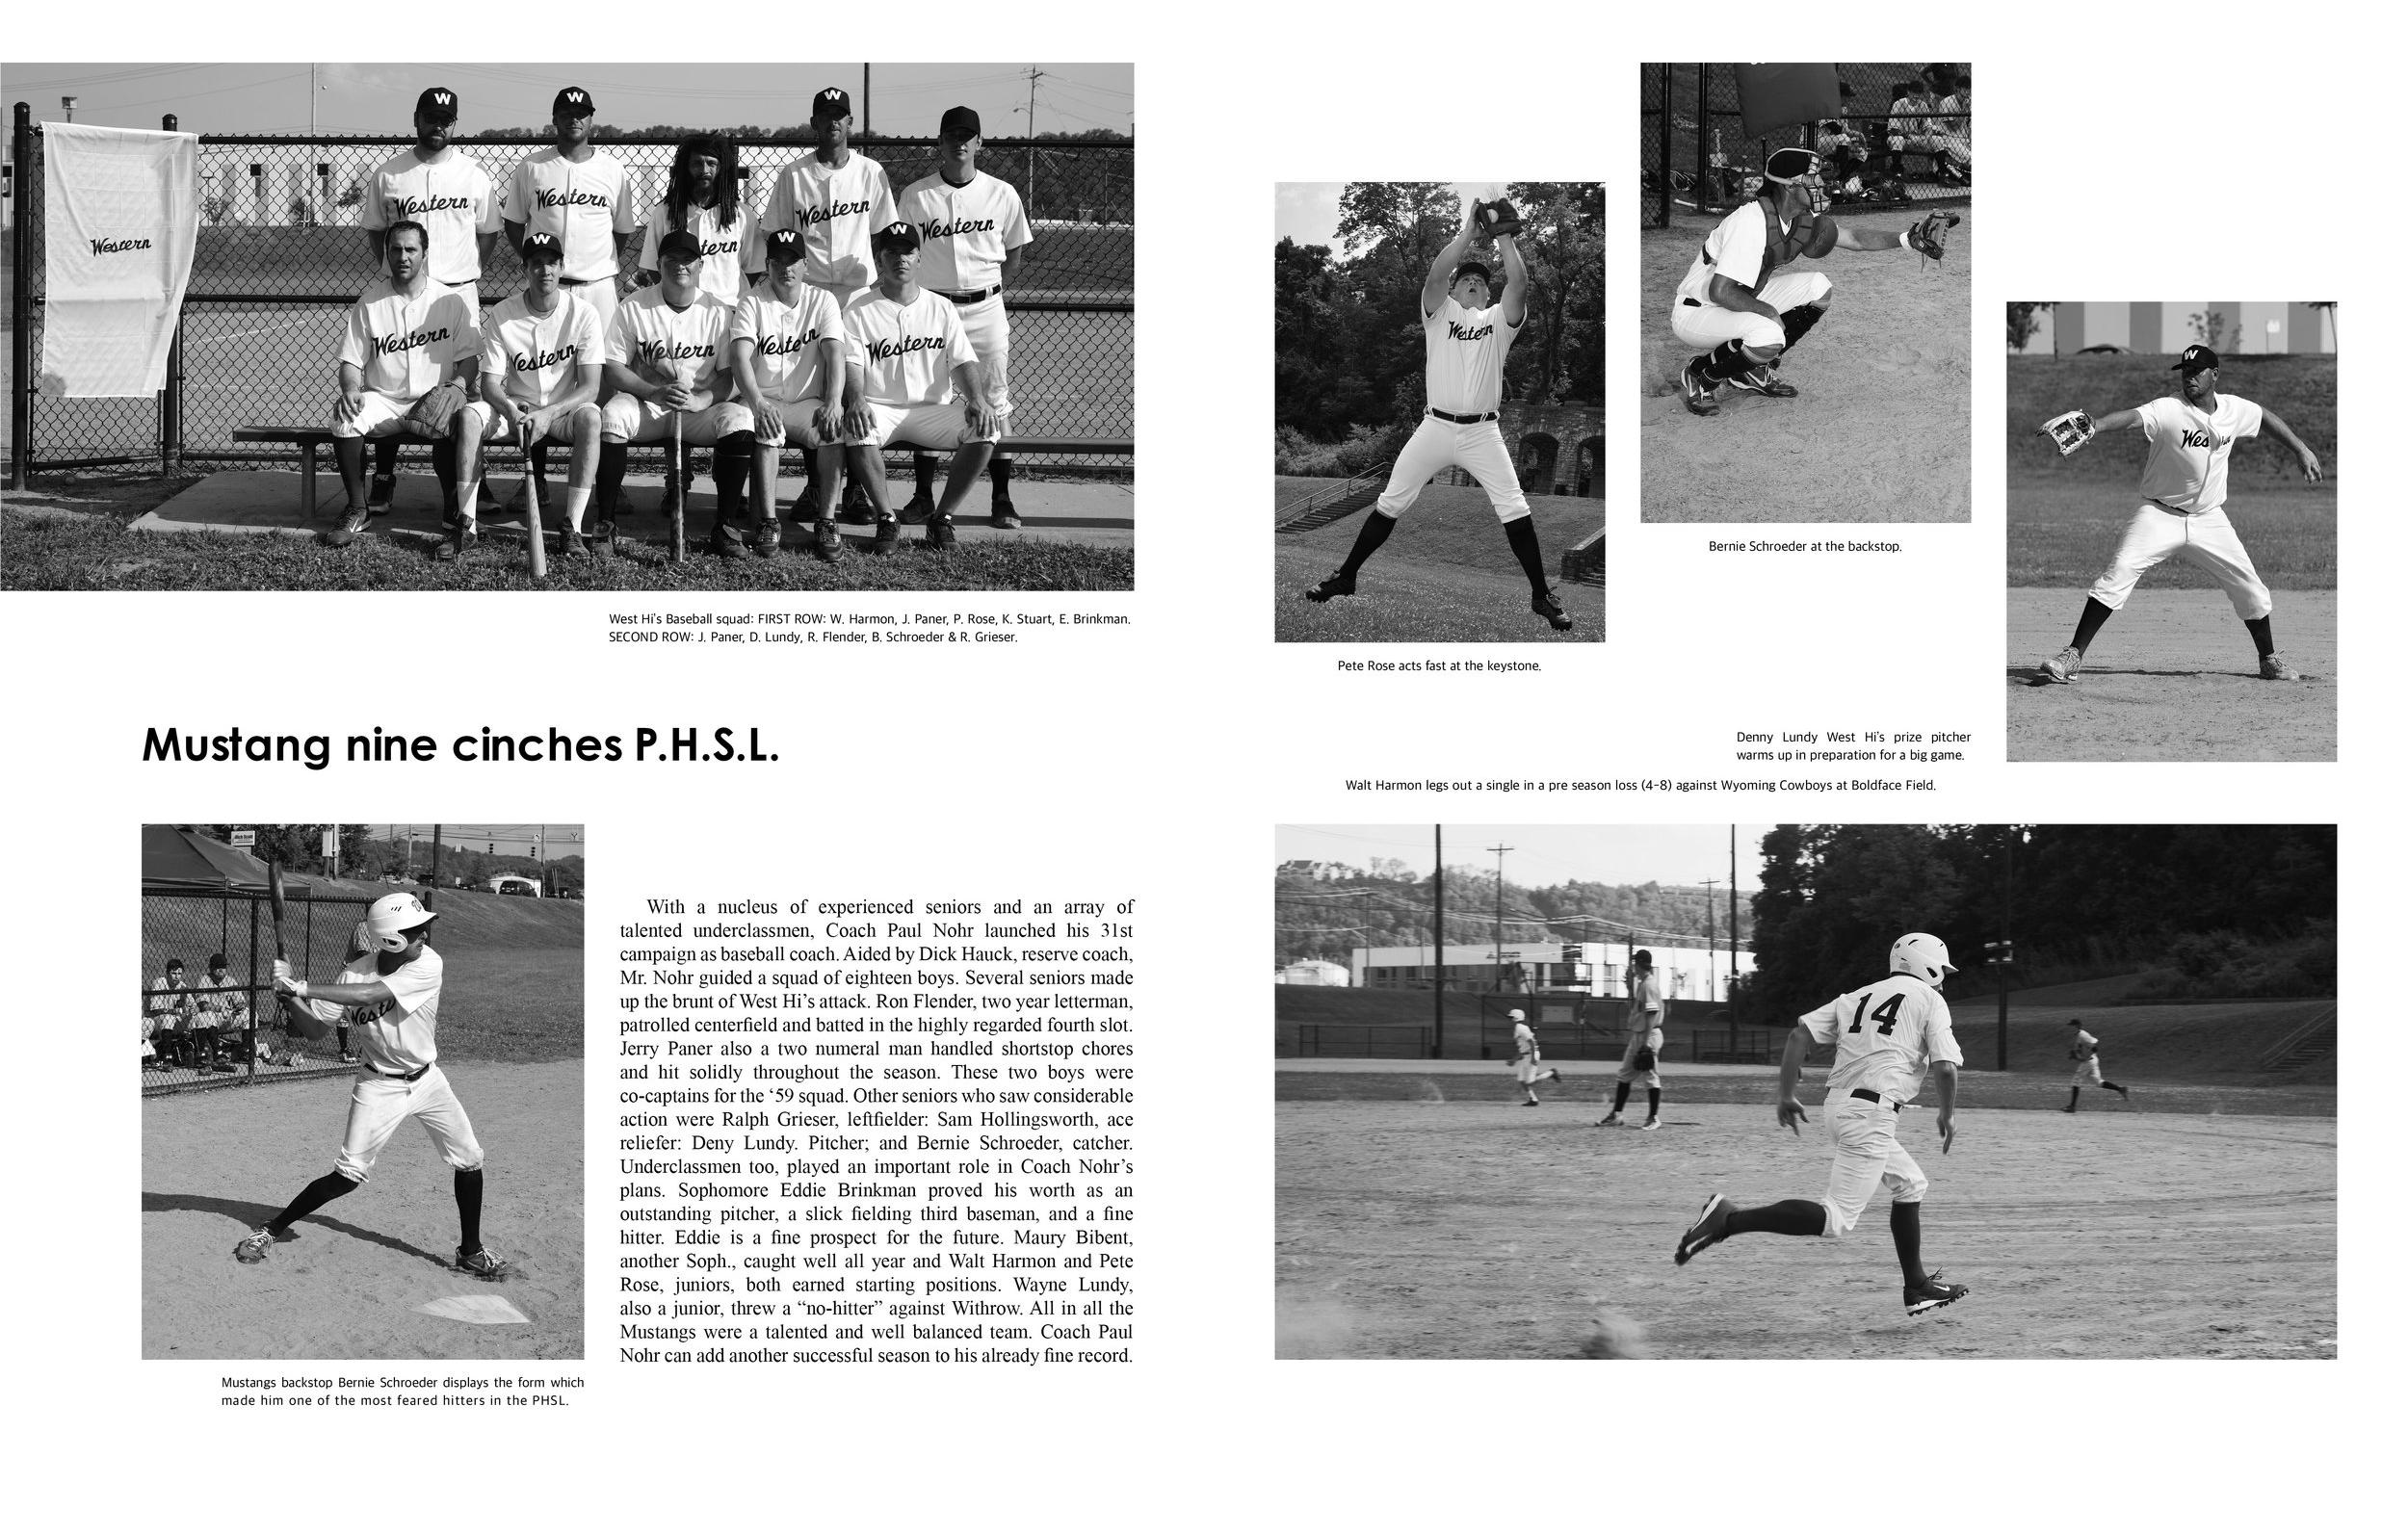 yearbook_chc-ipad10.jpg